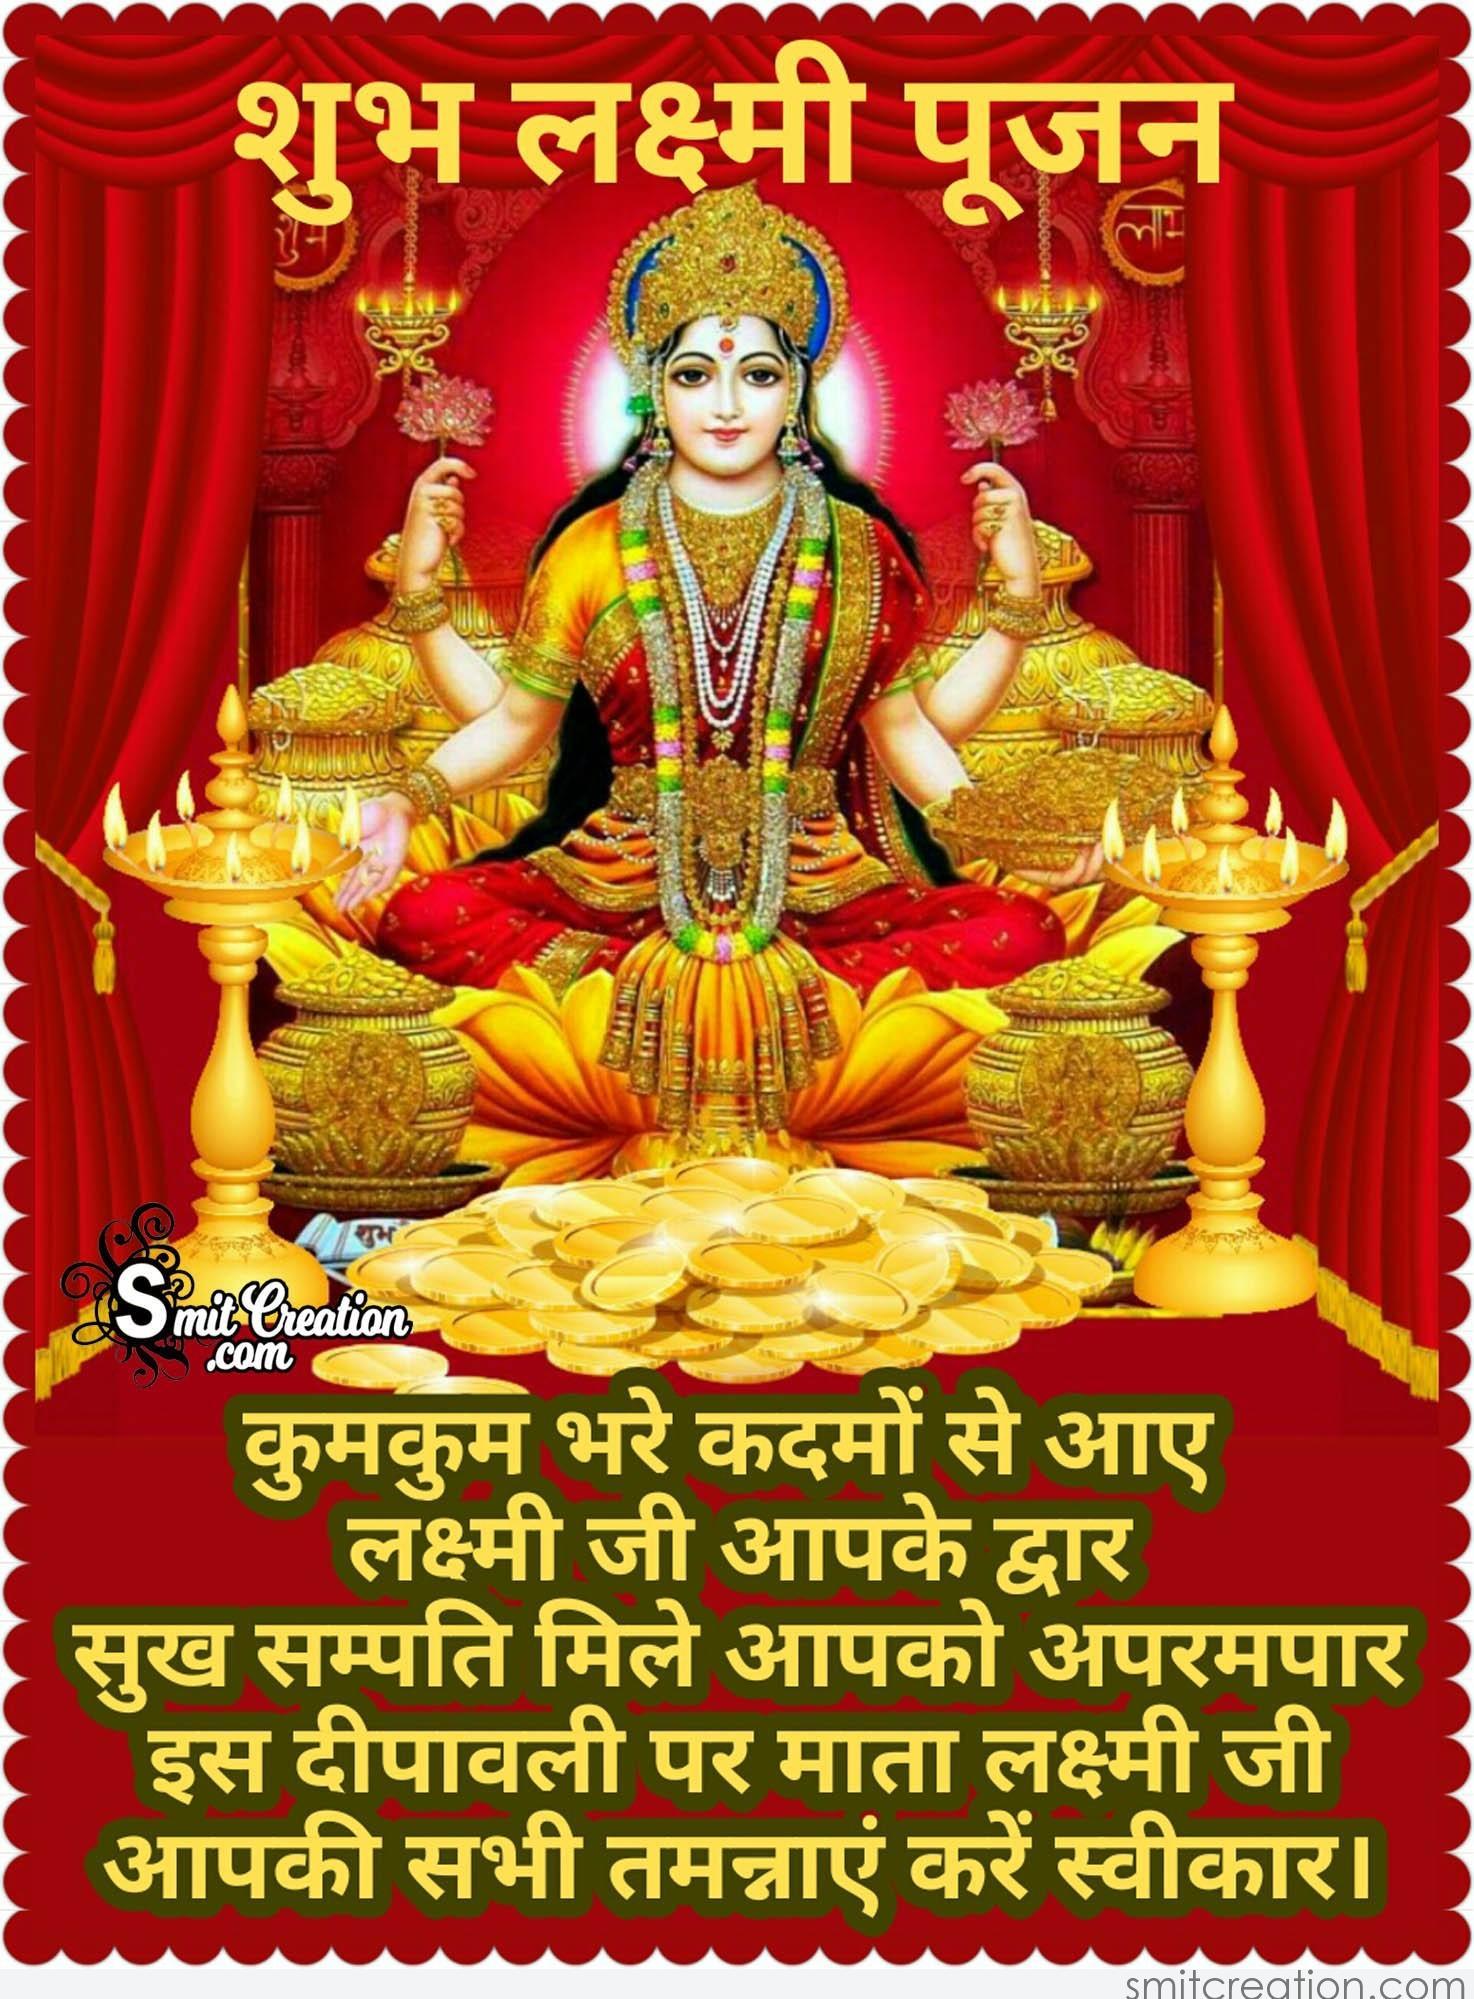 Shubh Lakshmi Pujan Wishes - SmitCreation.com